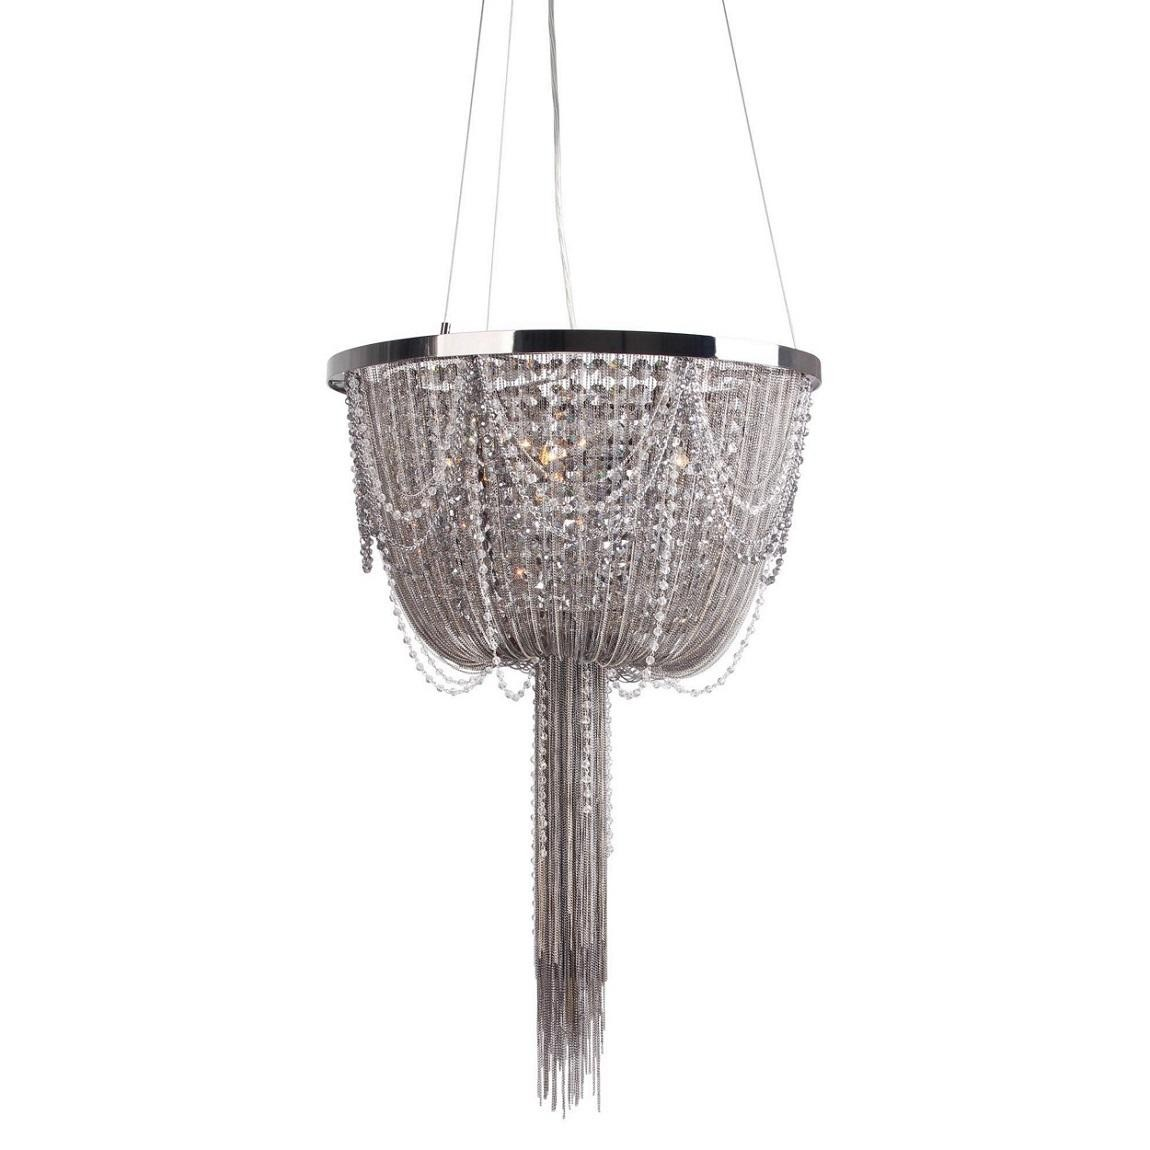 debenhams-scarlett-chandelier.jpg